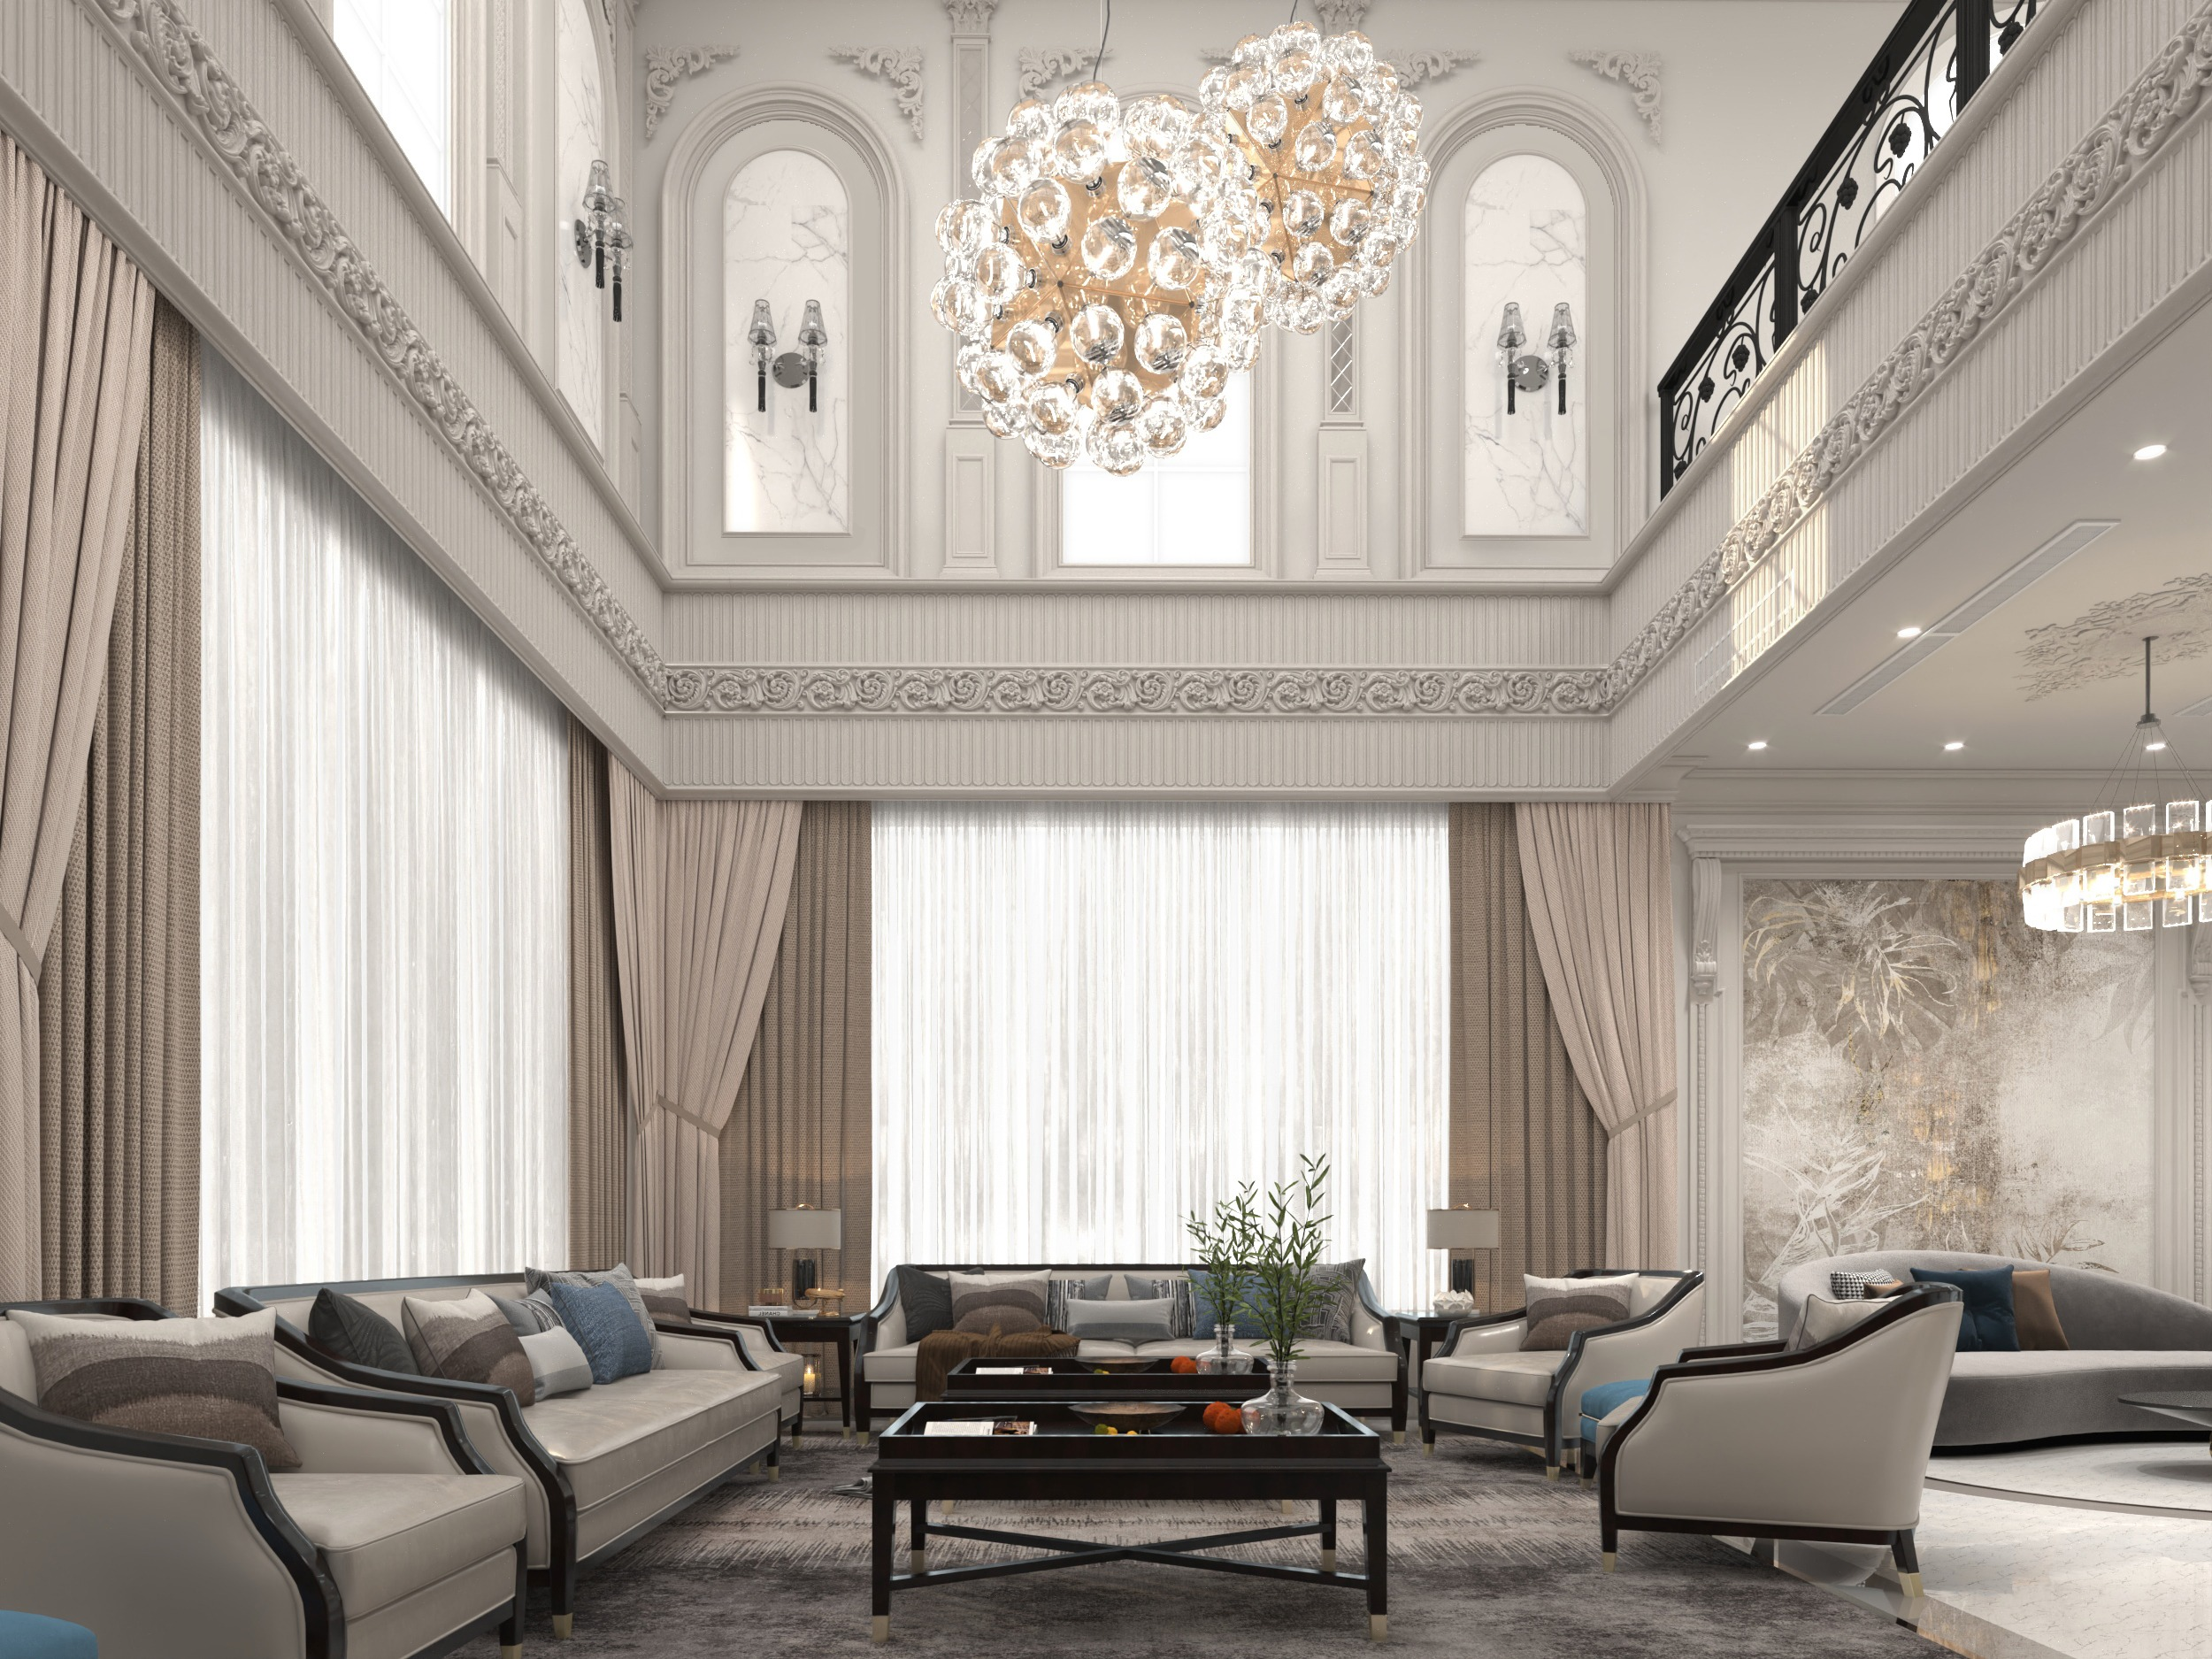 golden lights - amazing wall decorating - sitting area